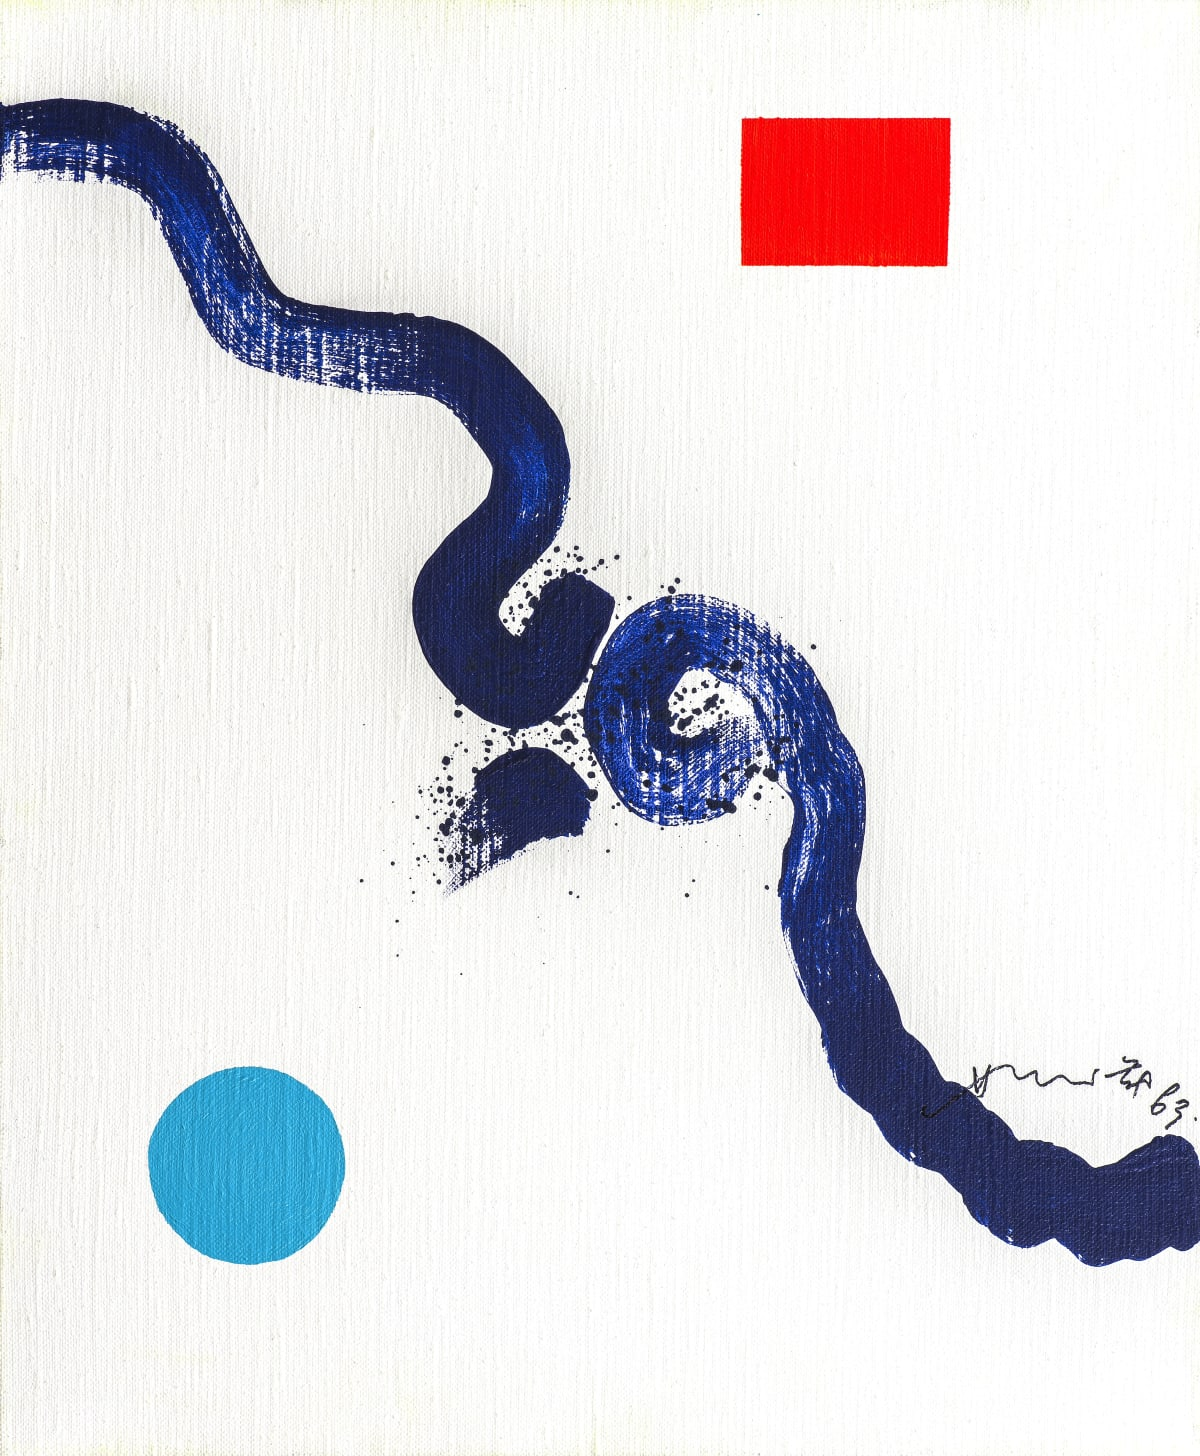 Hsiao Chin 蕭勤, Illuminated Heart-1 (Cuore Illuminato-1) 妙心-1, 1963